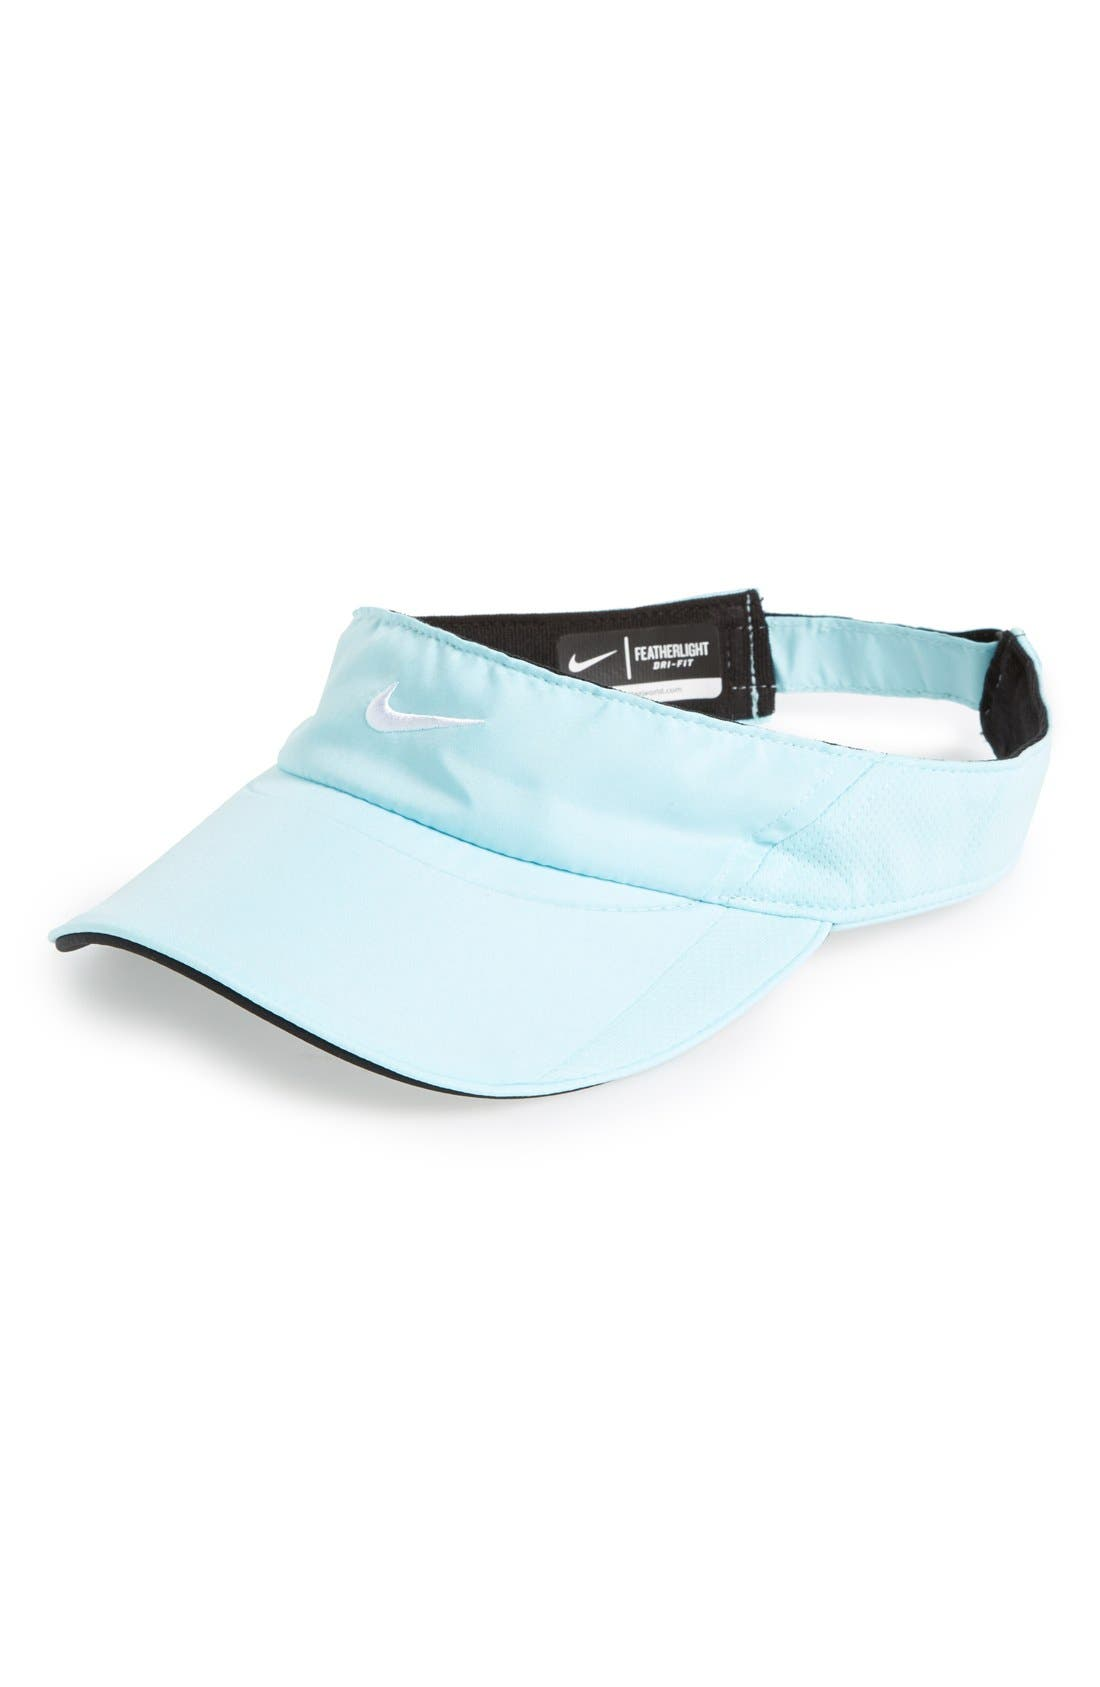 Alternate Image 1 Selected - Nike Dri-FIT Sport Visor